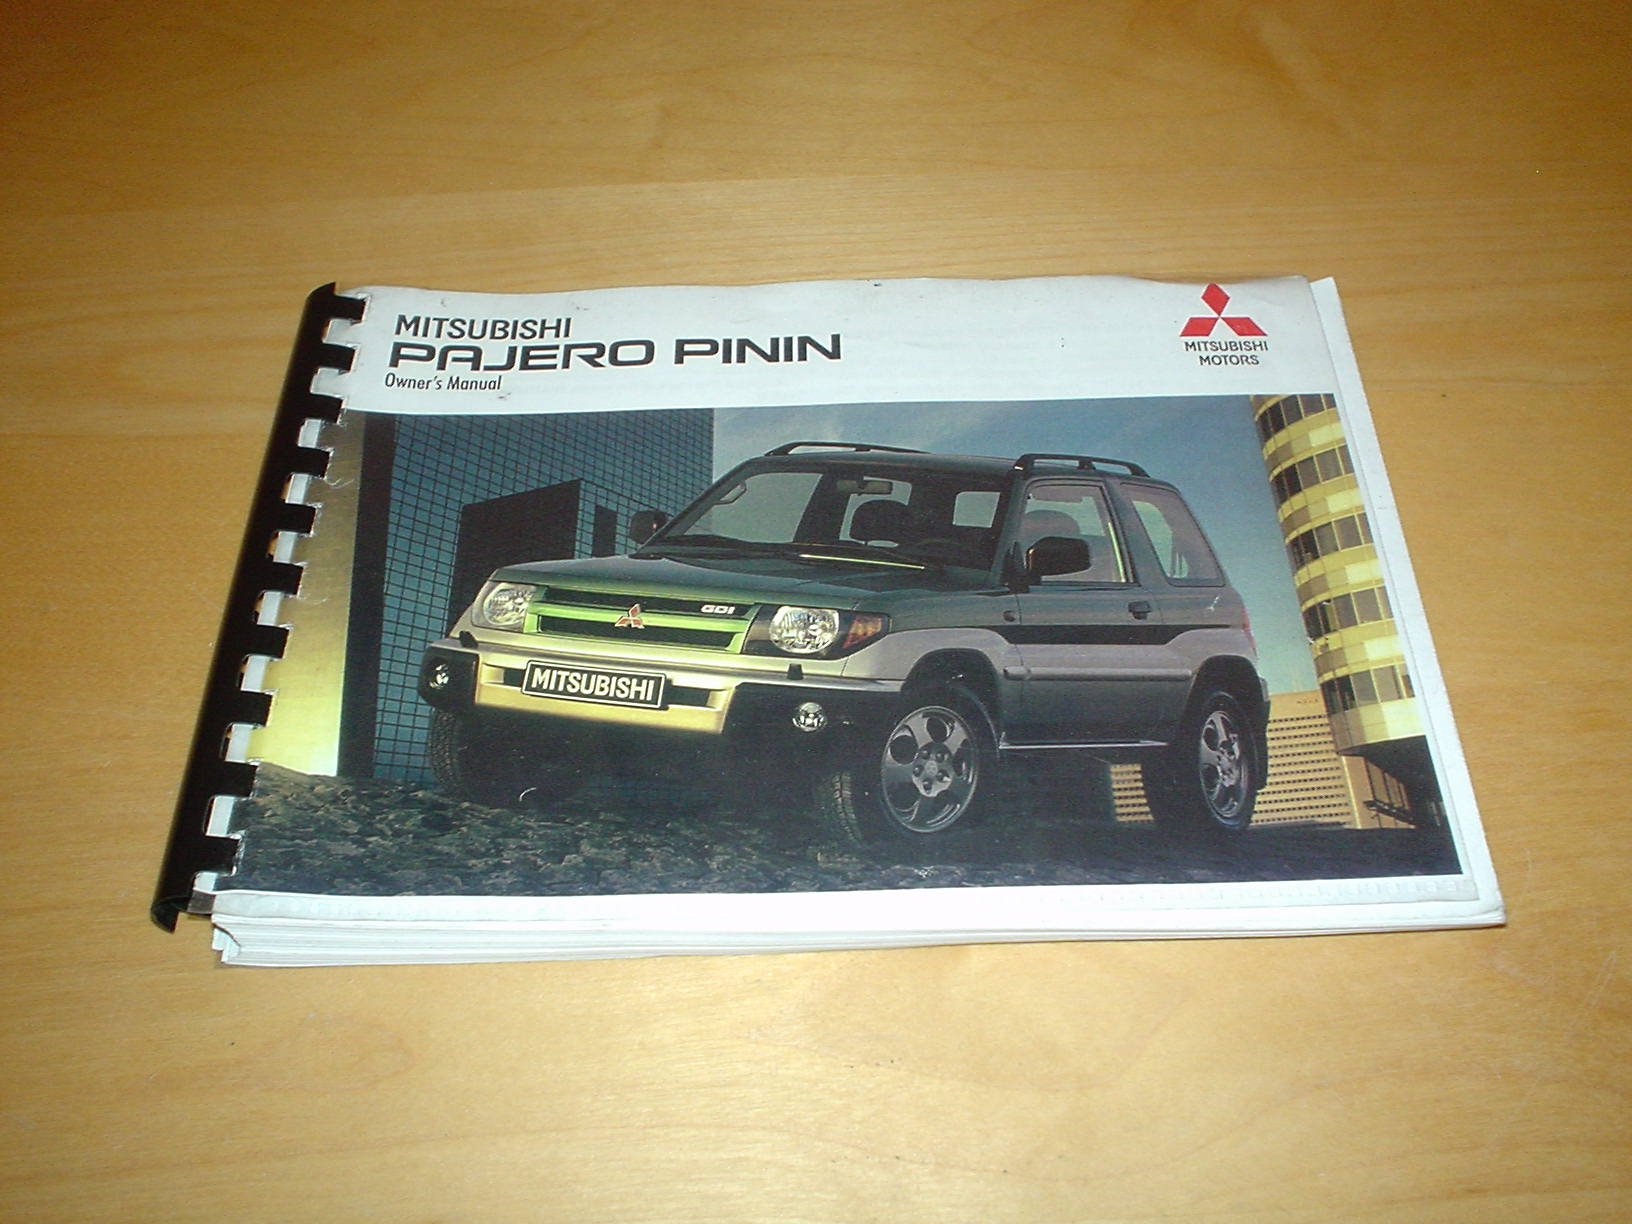 MITSUBISHI SHOGUN / PAJERO PININ OWNERS MANUAL HANDBOOK - 1.8 4G93 2.0 4G94  LITRE ENGINE - OWNER'S HAND BOOK MANUAL: Amazon.co.uk: MITSUBISHI: Books